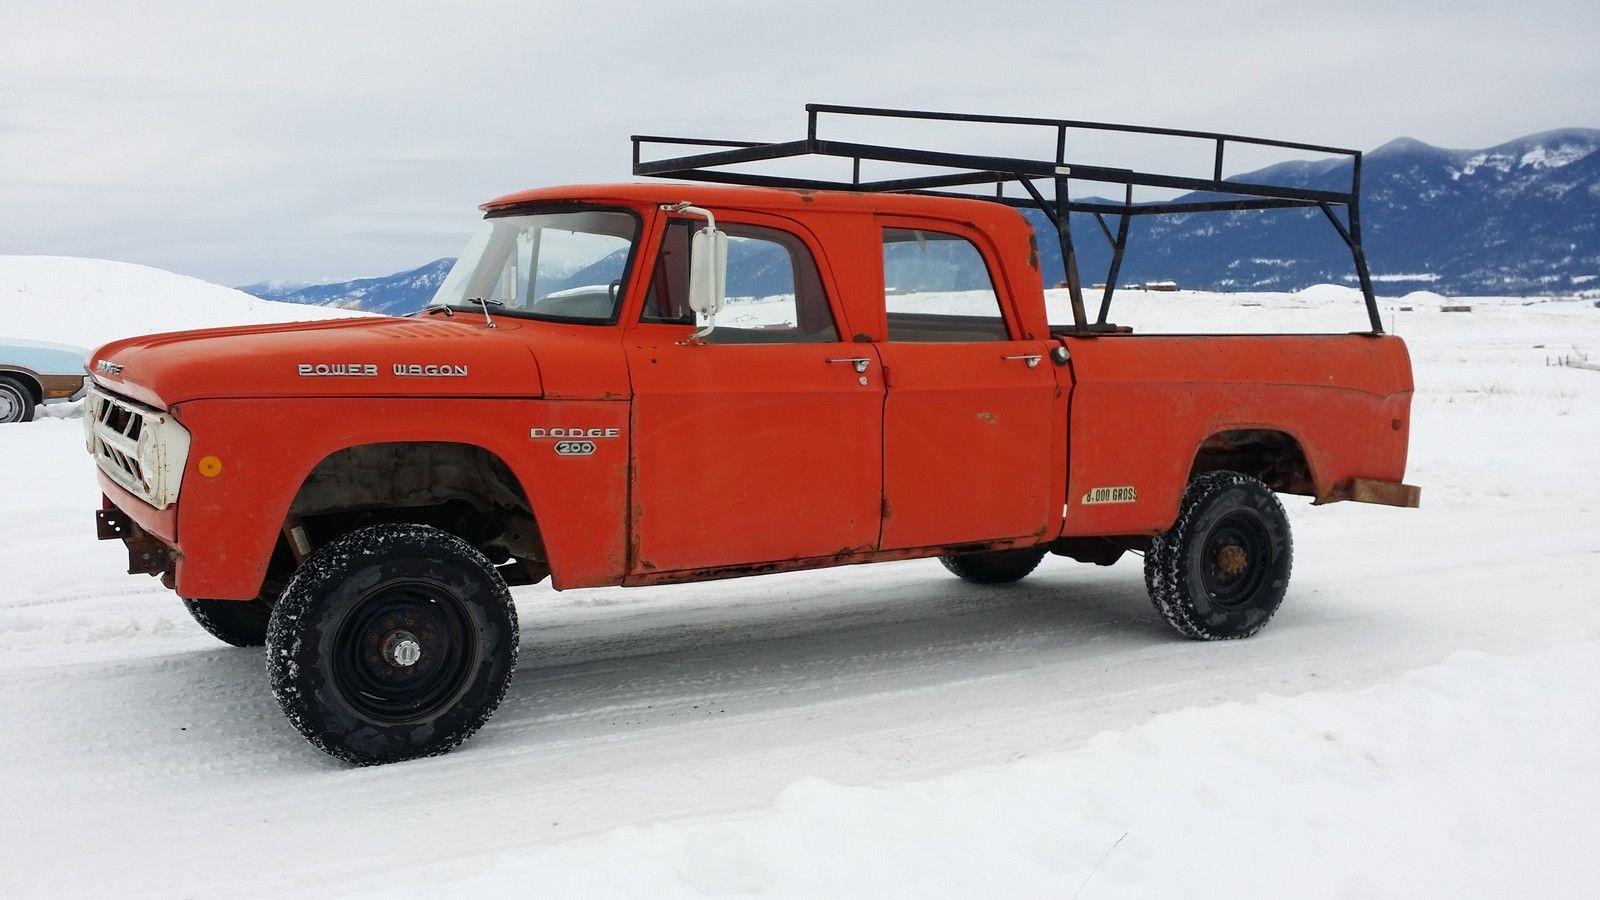 1968 Dodge Power Wagon Crew Cab W200 3 4ton 4x4sweptline Pickup Chevrolet Truck Runs Nice For Sale In Eureka Montana United States